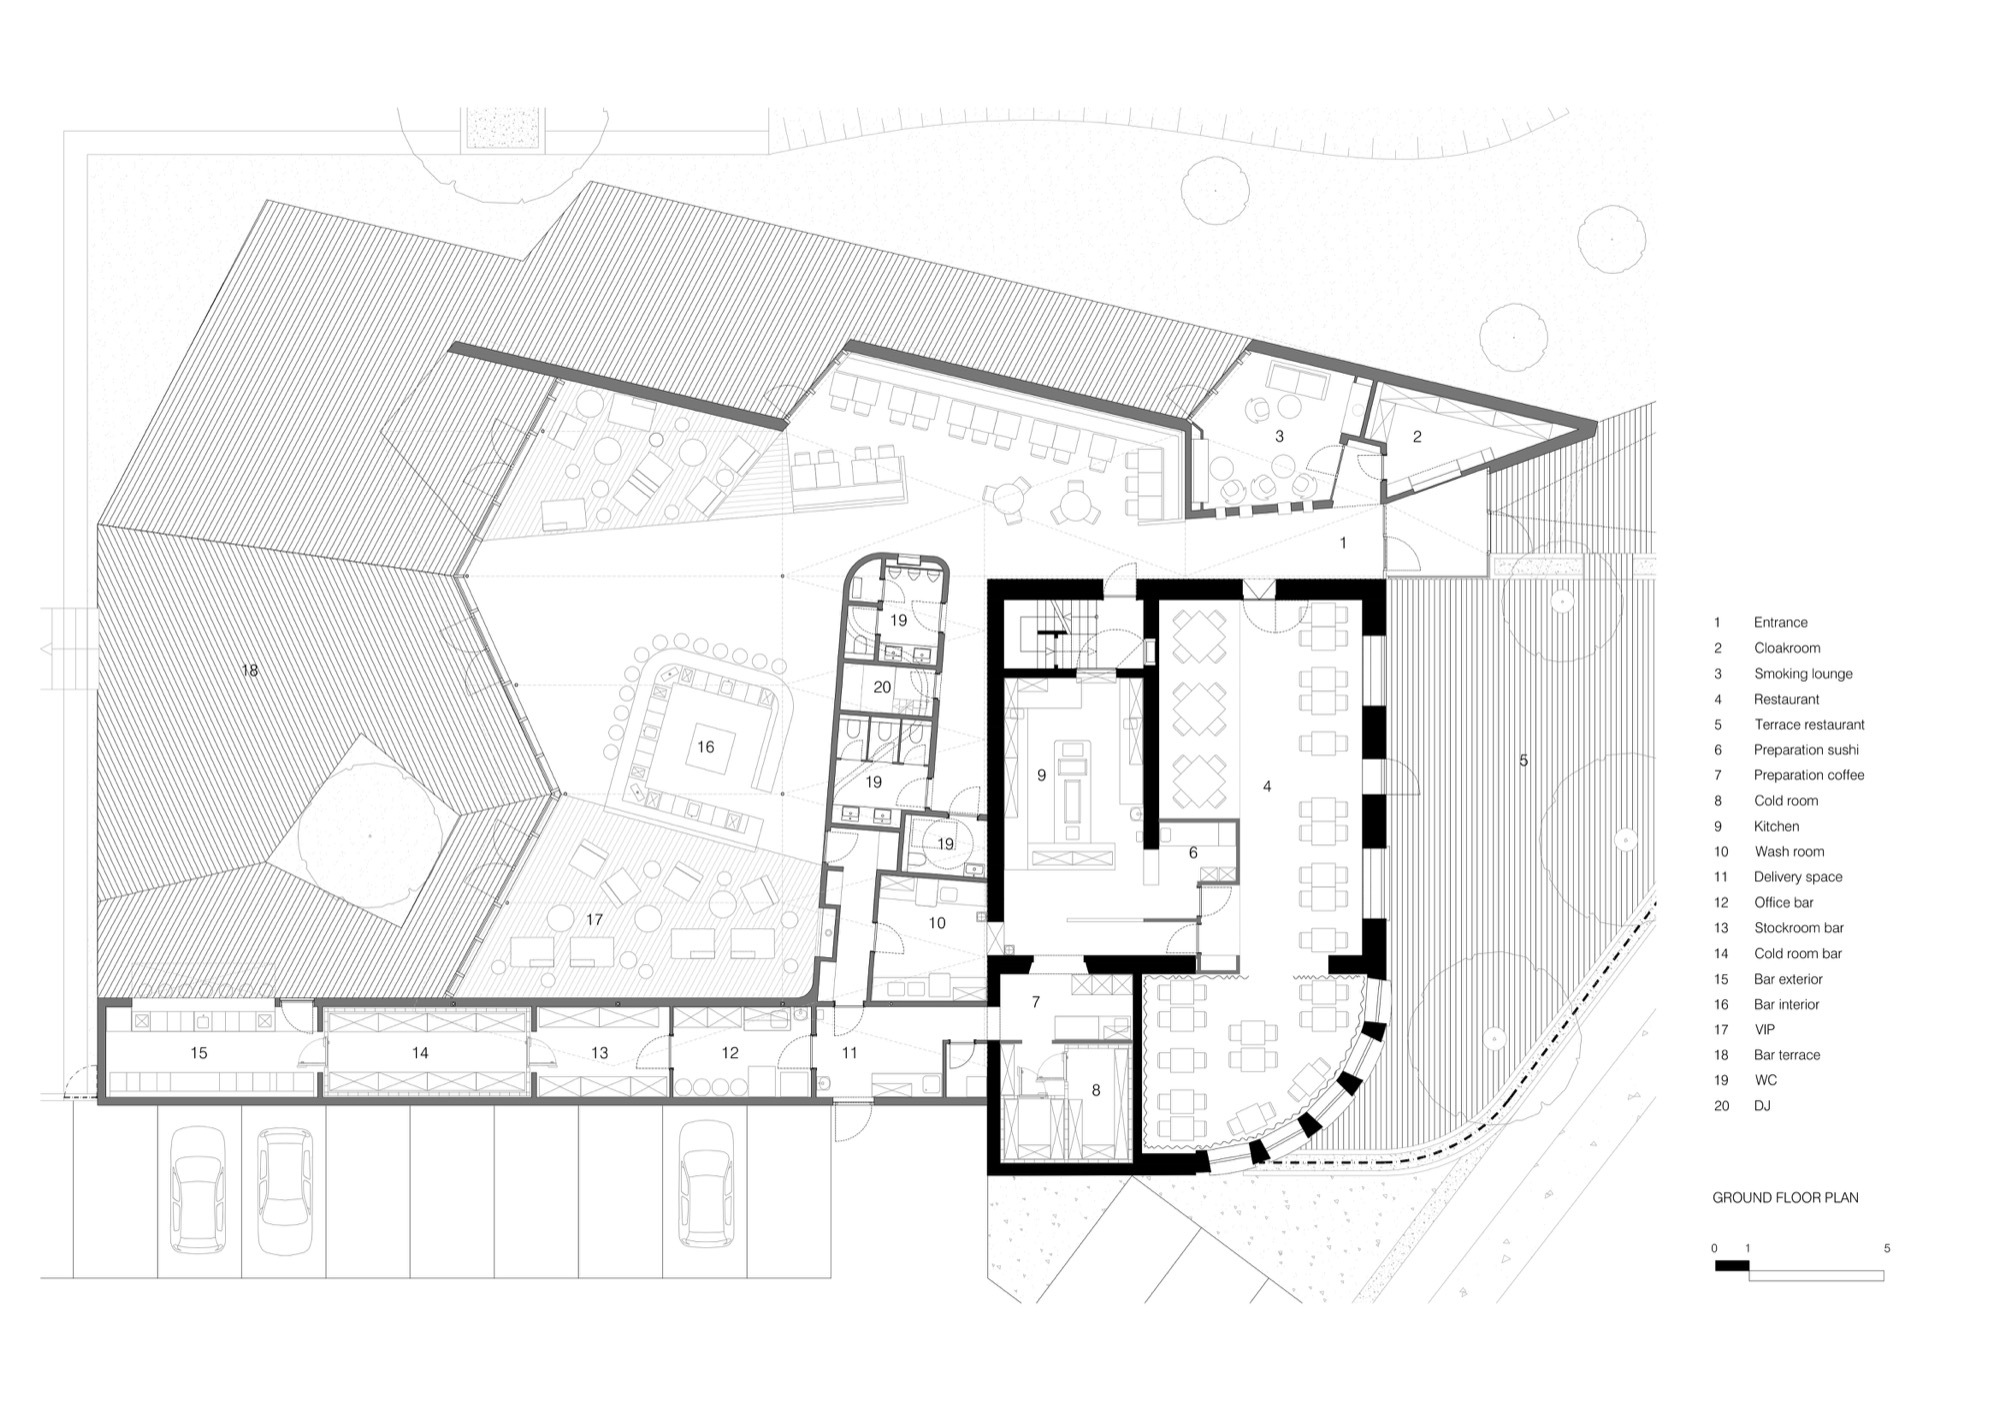 Gallery Of Boos Beach Club Restaurant Metaform Architects 16